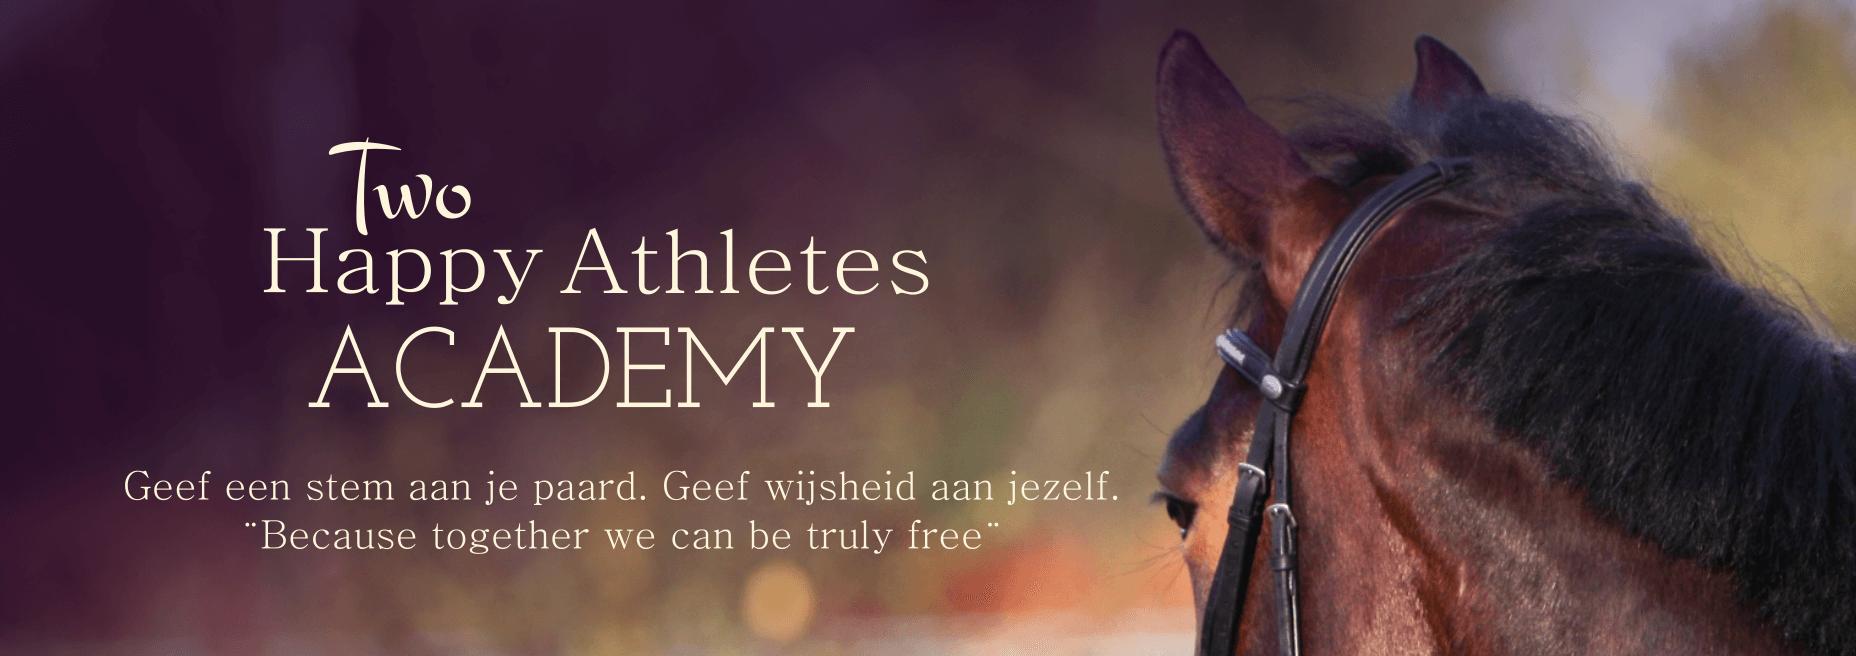 Two Happy Athletes Academy